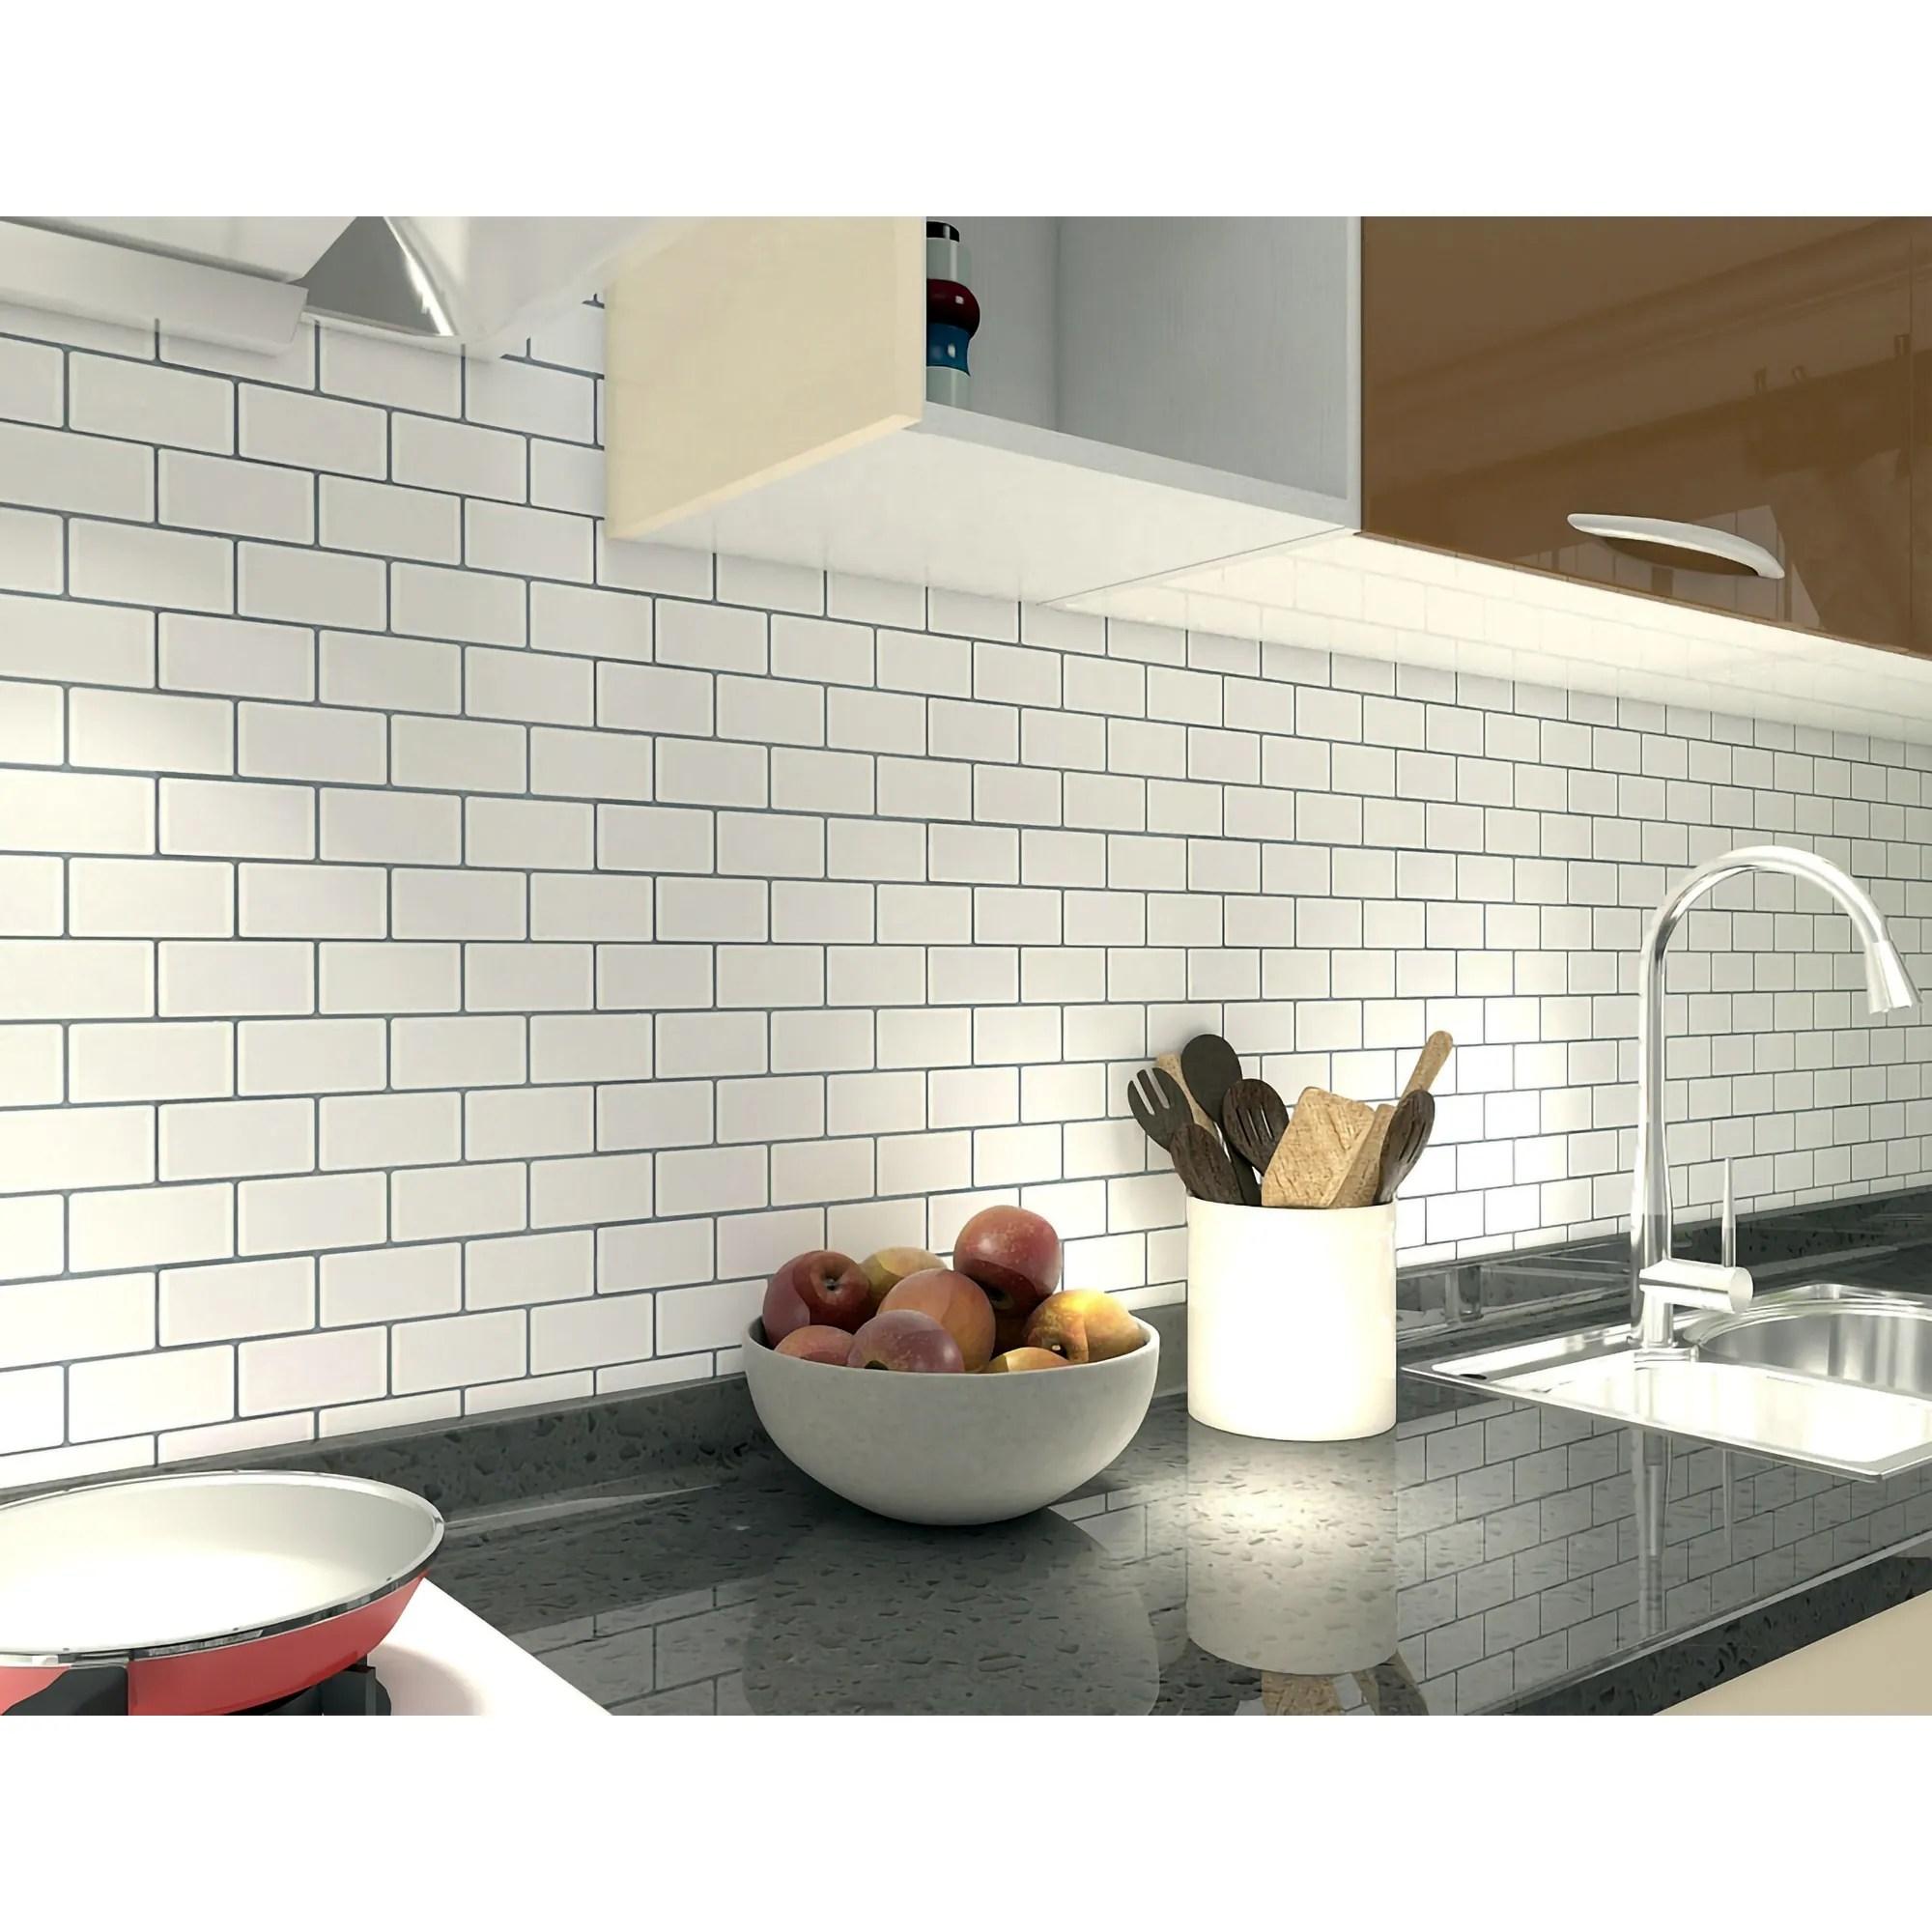 art3d 12 x12 vinyl peel and stick backsplash tile 10 pack floral white